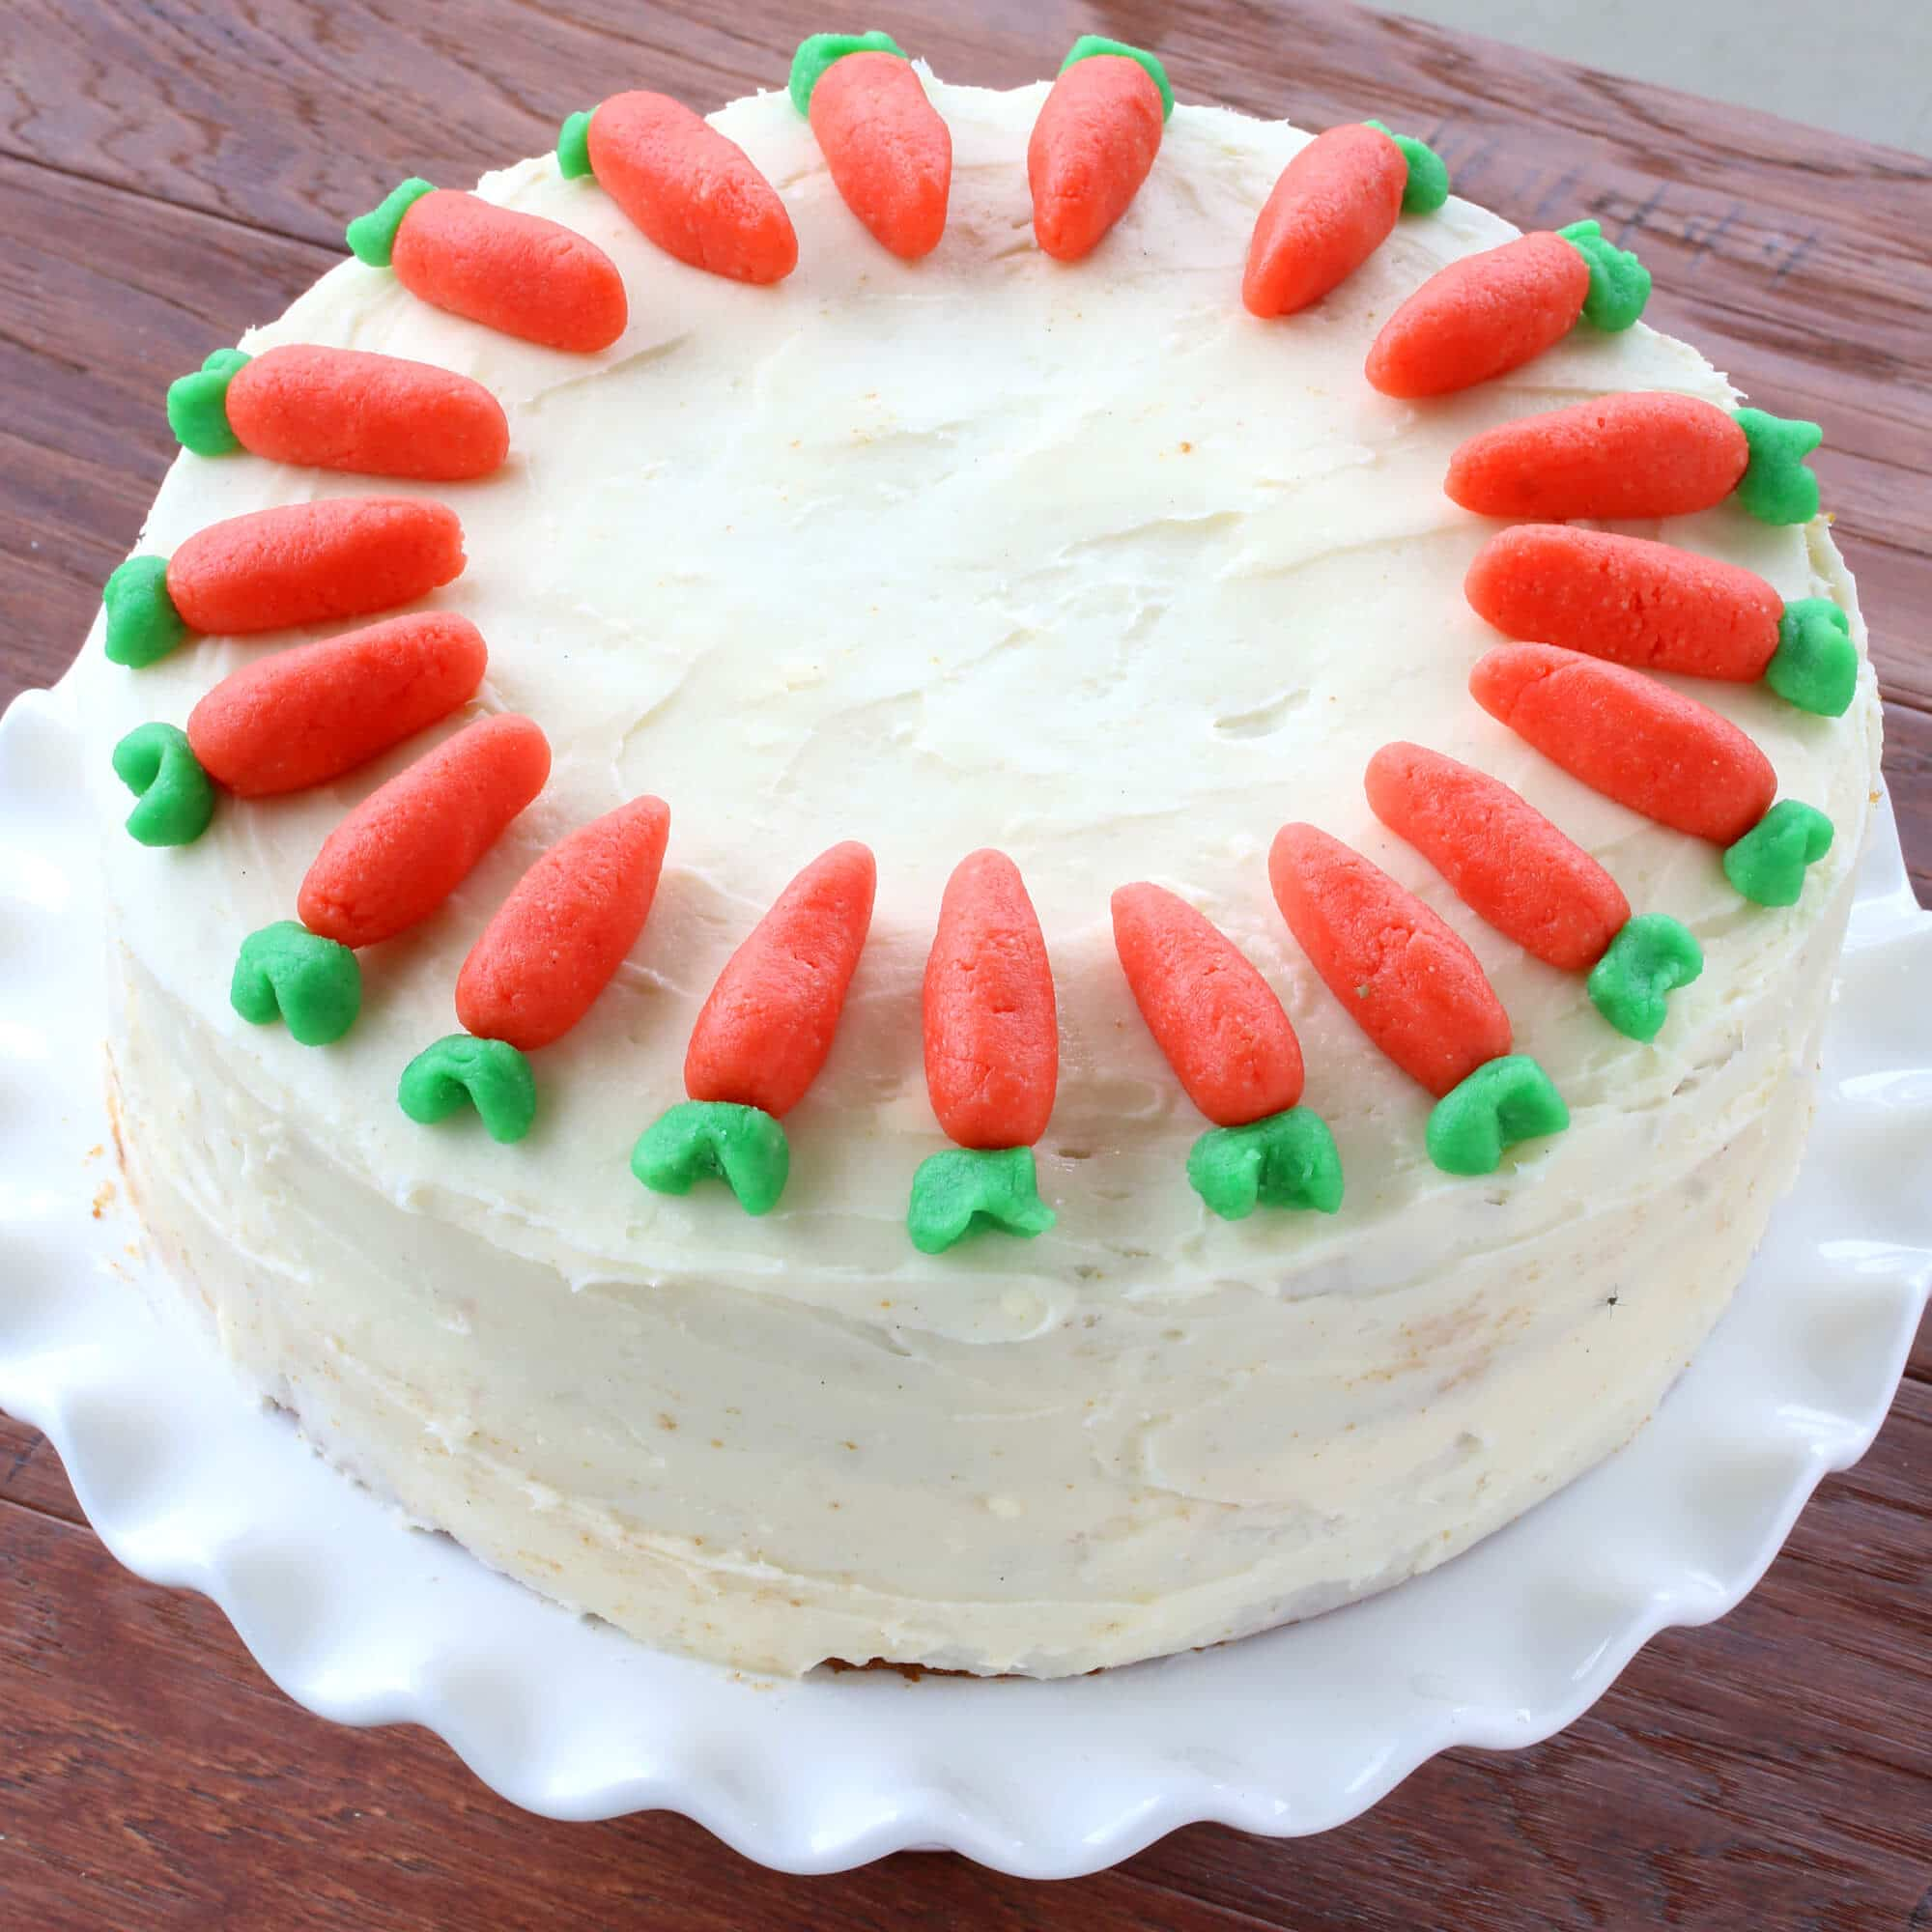 gluten free carrot cake recipe best baking dessert dairy free pineapple coconut marzipan